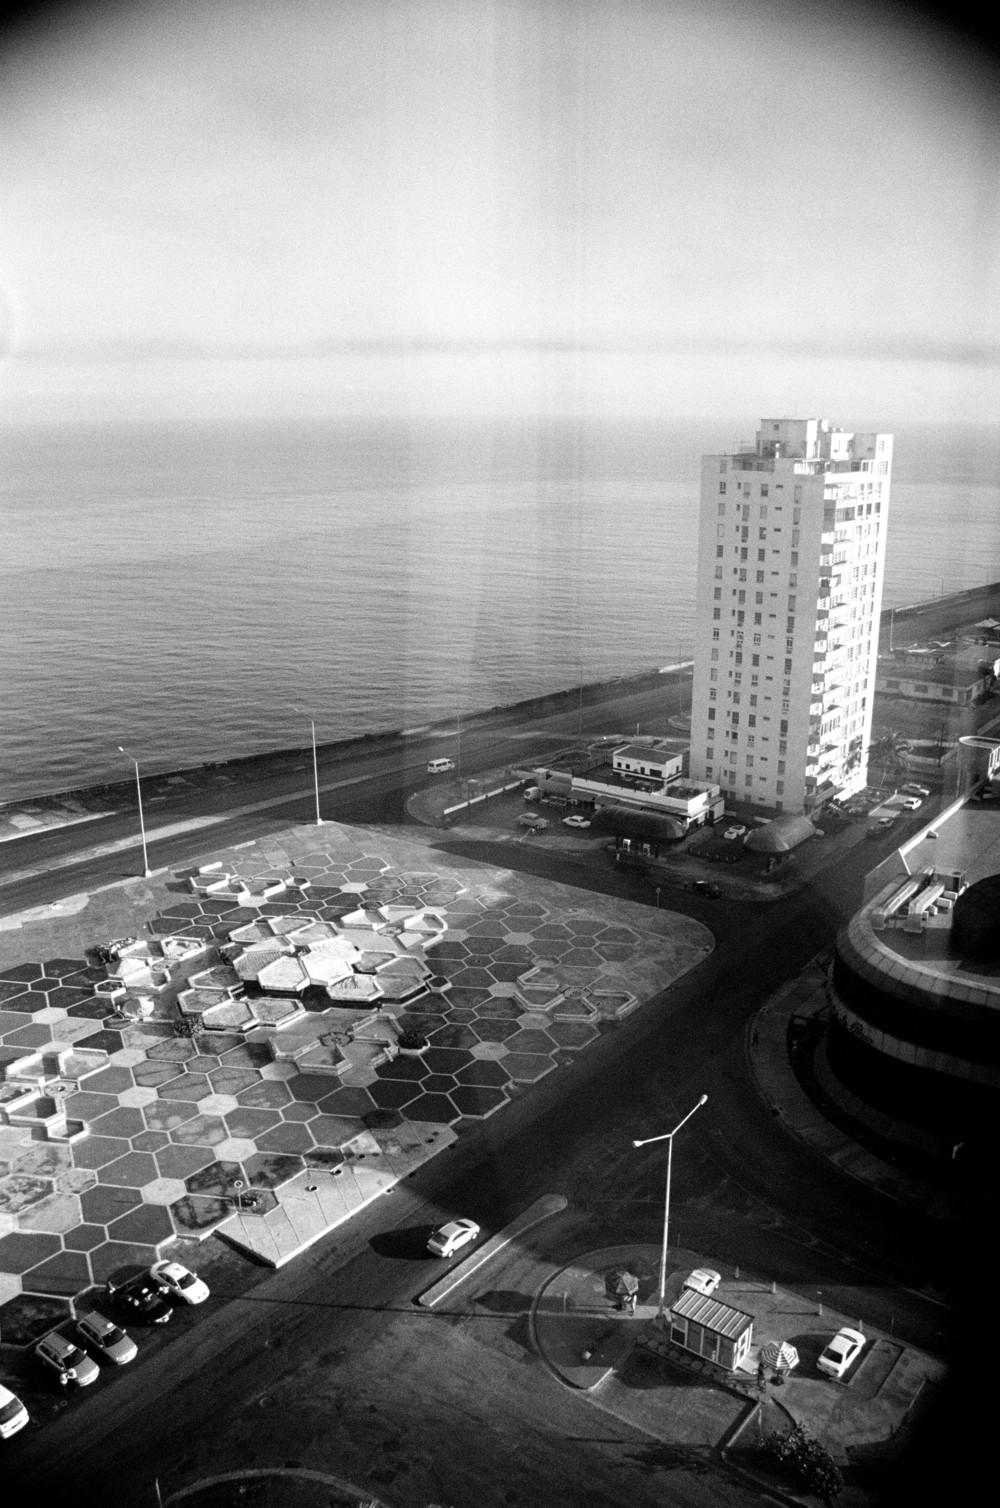 View from Hotel Meliá Cohiba, Havana, Cuba, 2004